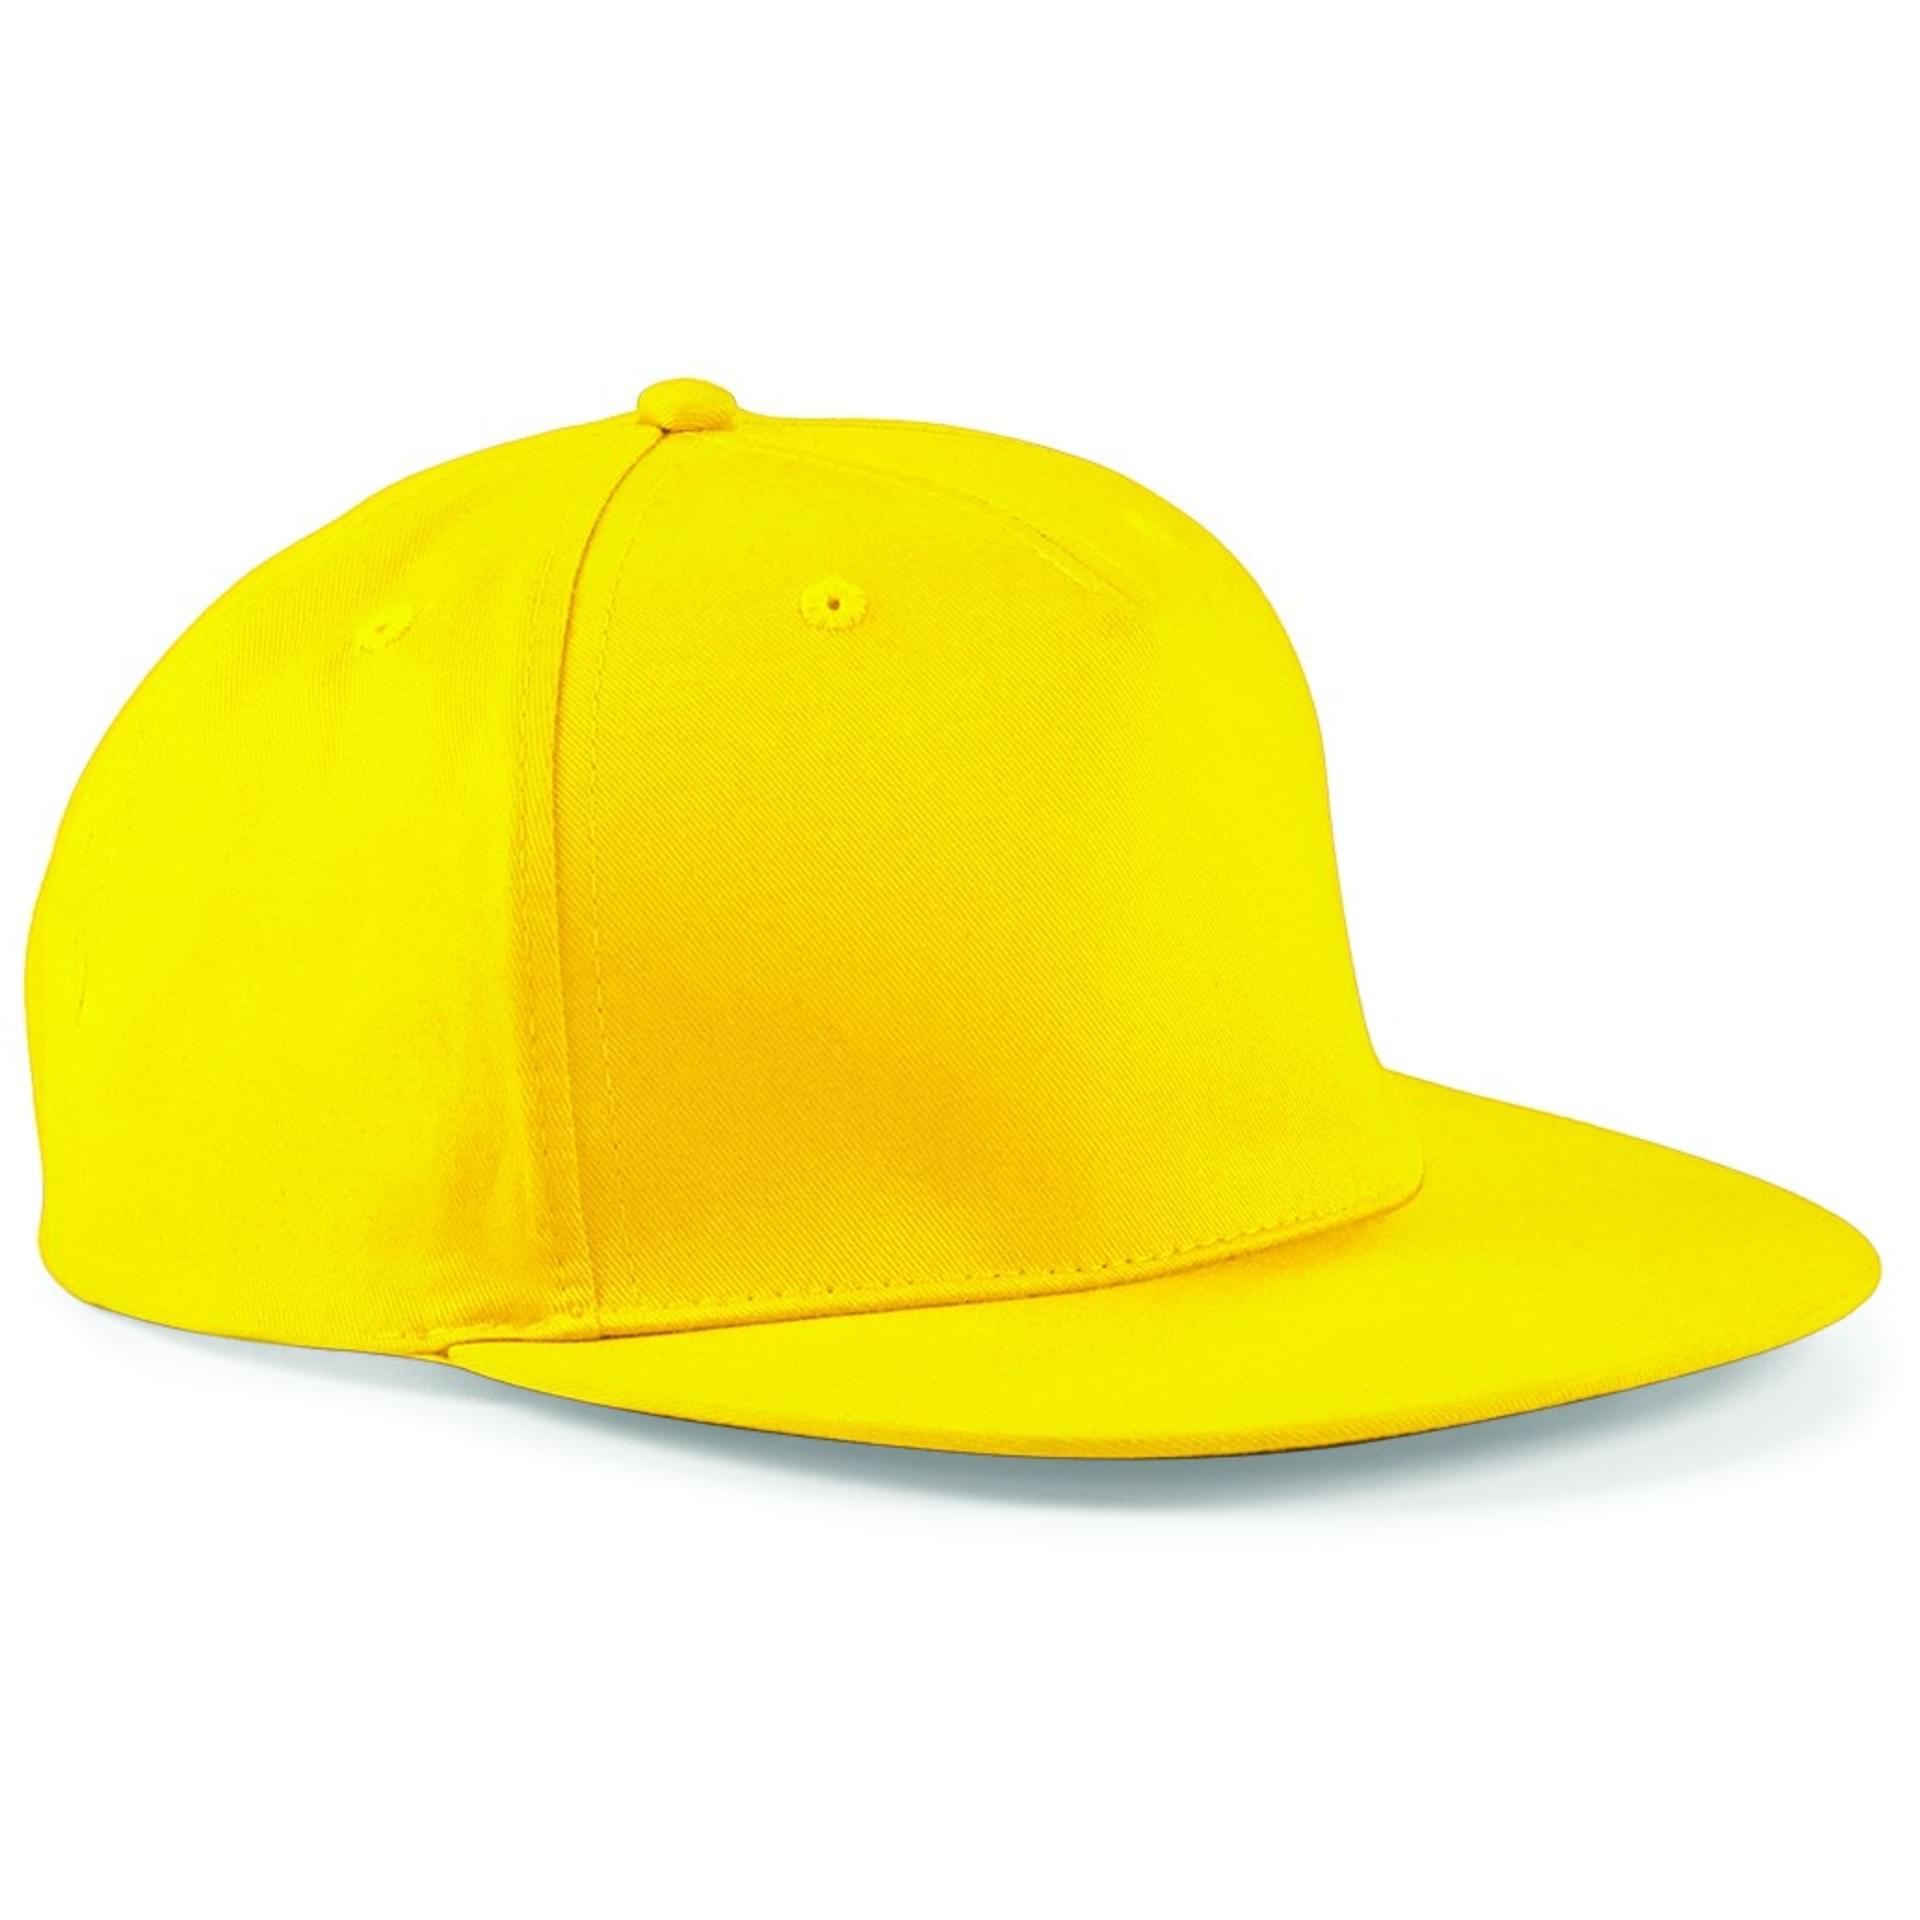 592c80a29efb8 ... CASQUETTE STYLE RAPPEUR 5 PANNEAUX Beechfield yellow. Couleur yellow